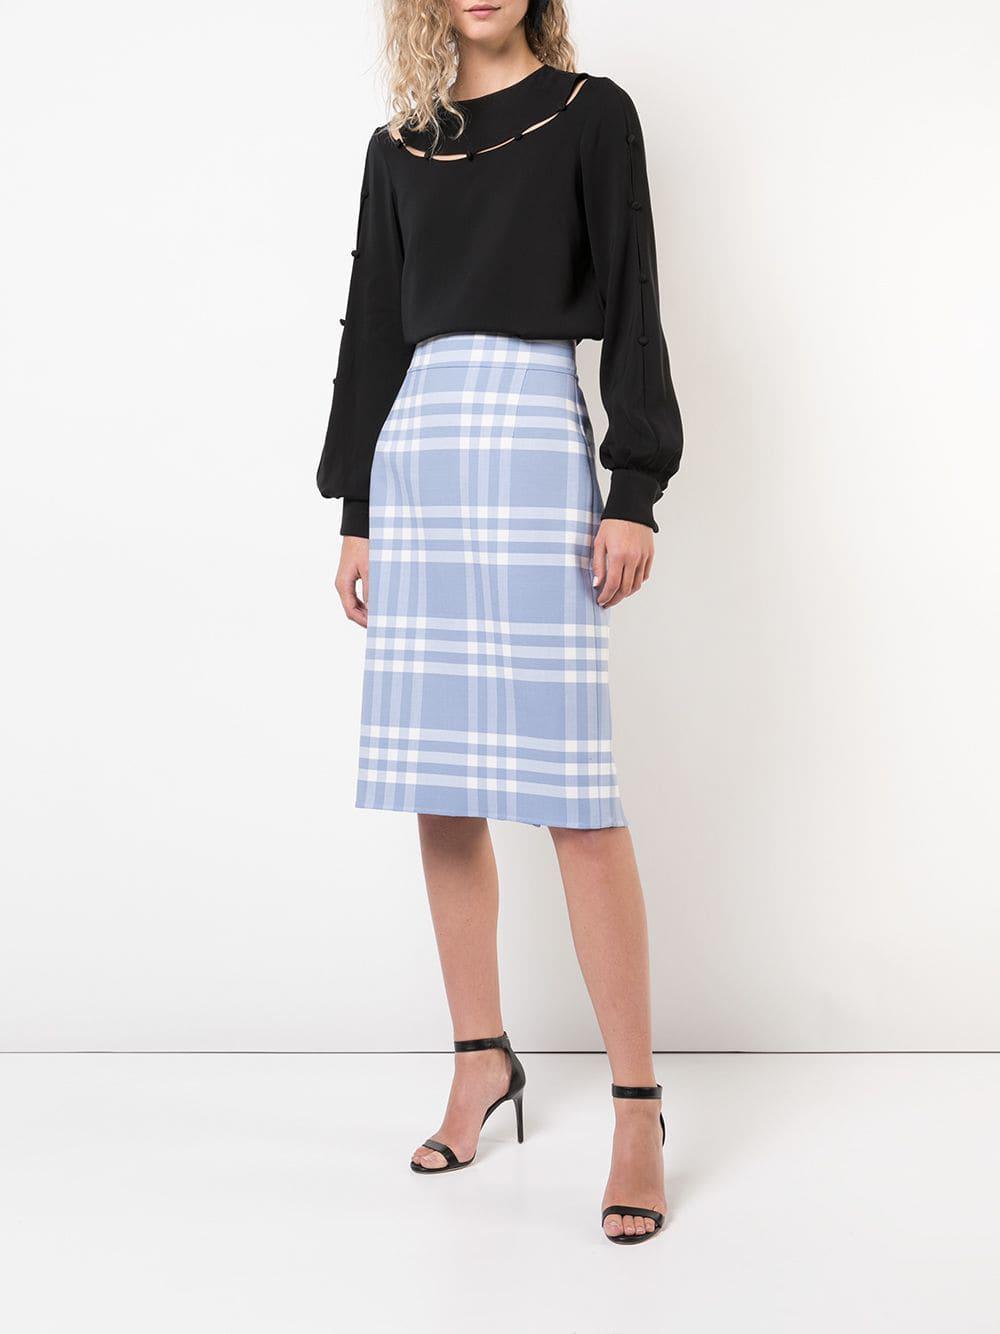 3594d103b Lyst - Oscar de la Renta Checked Pencil Skirt in Black